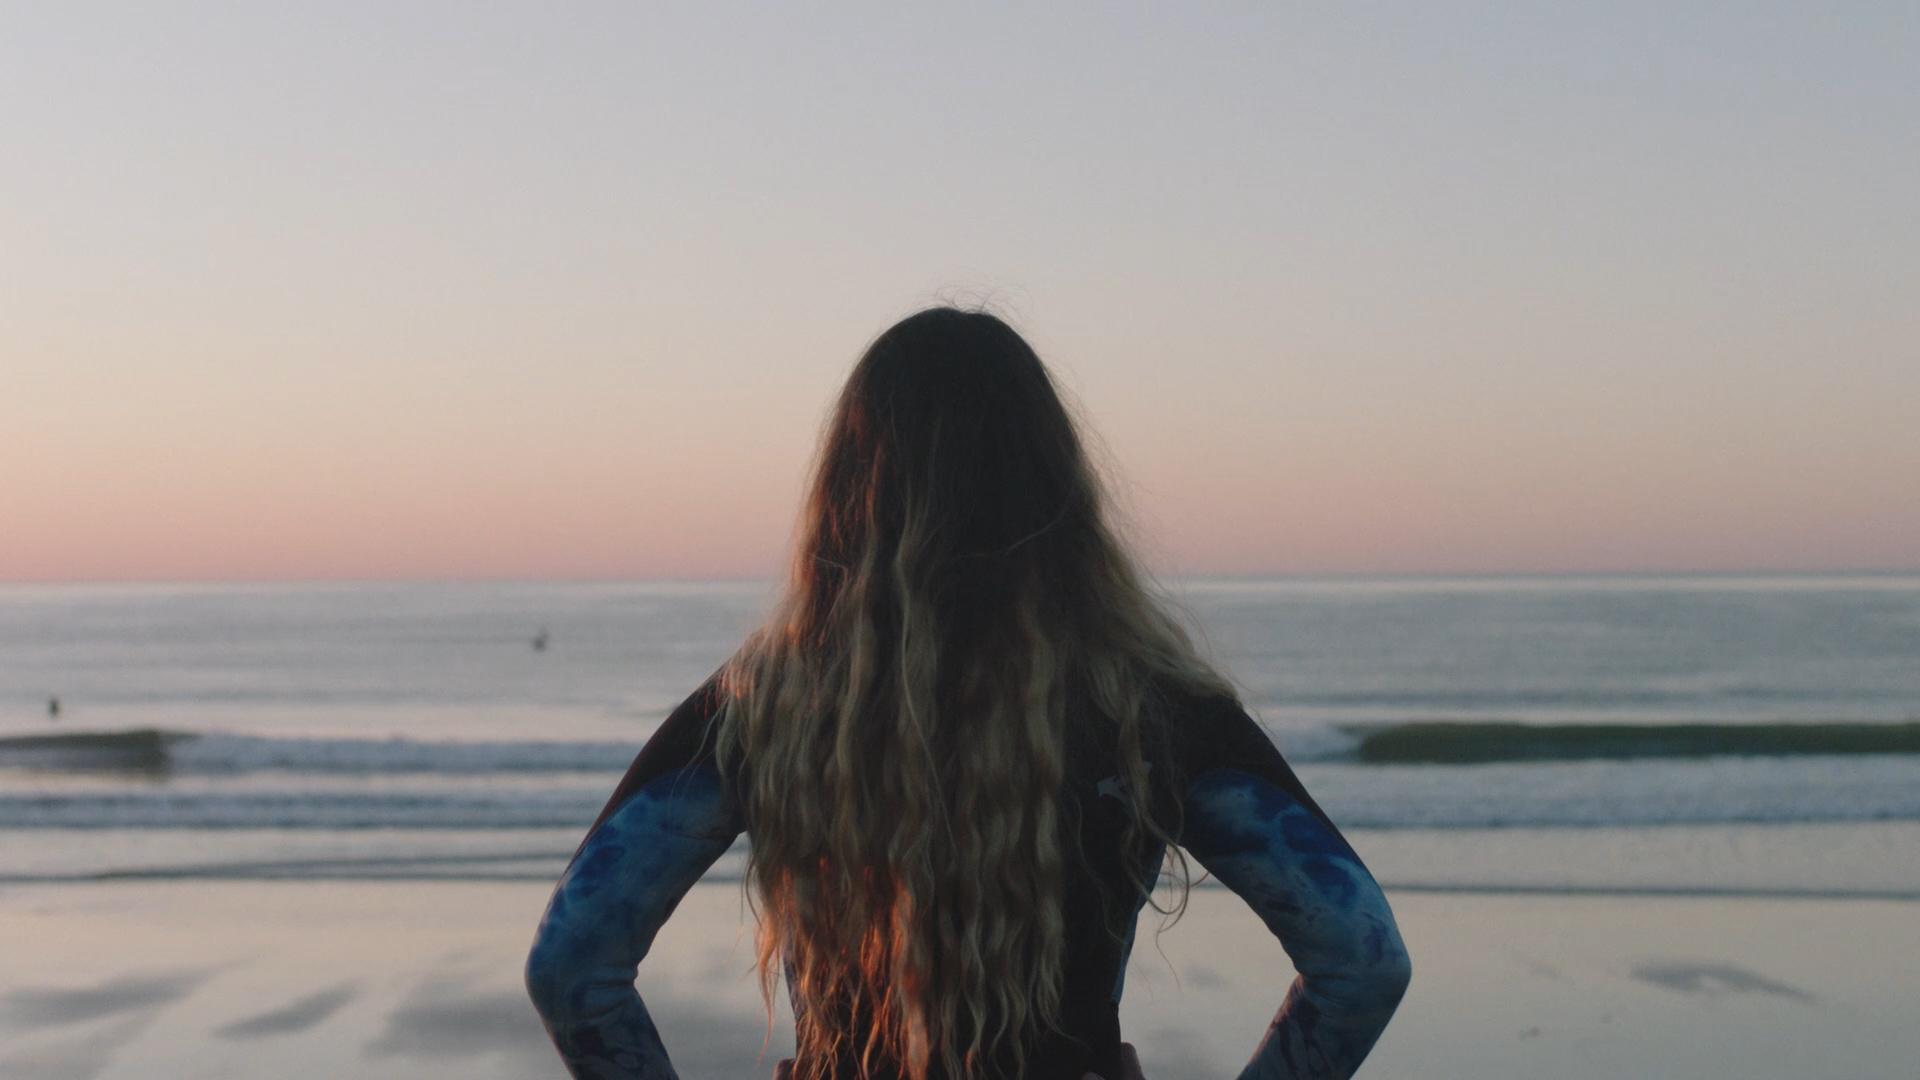 Dean Goes Surfing - Still 01 / dir. Caitlyn Greene / DP Mack Fisher